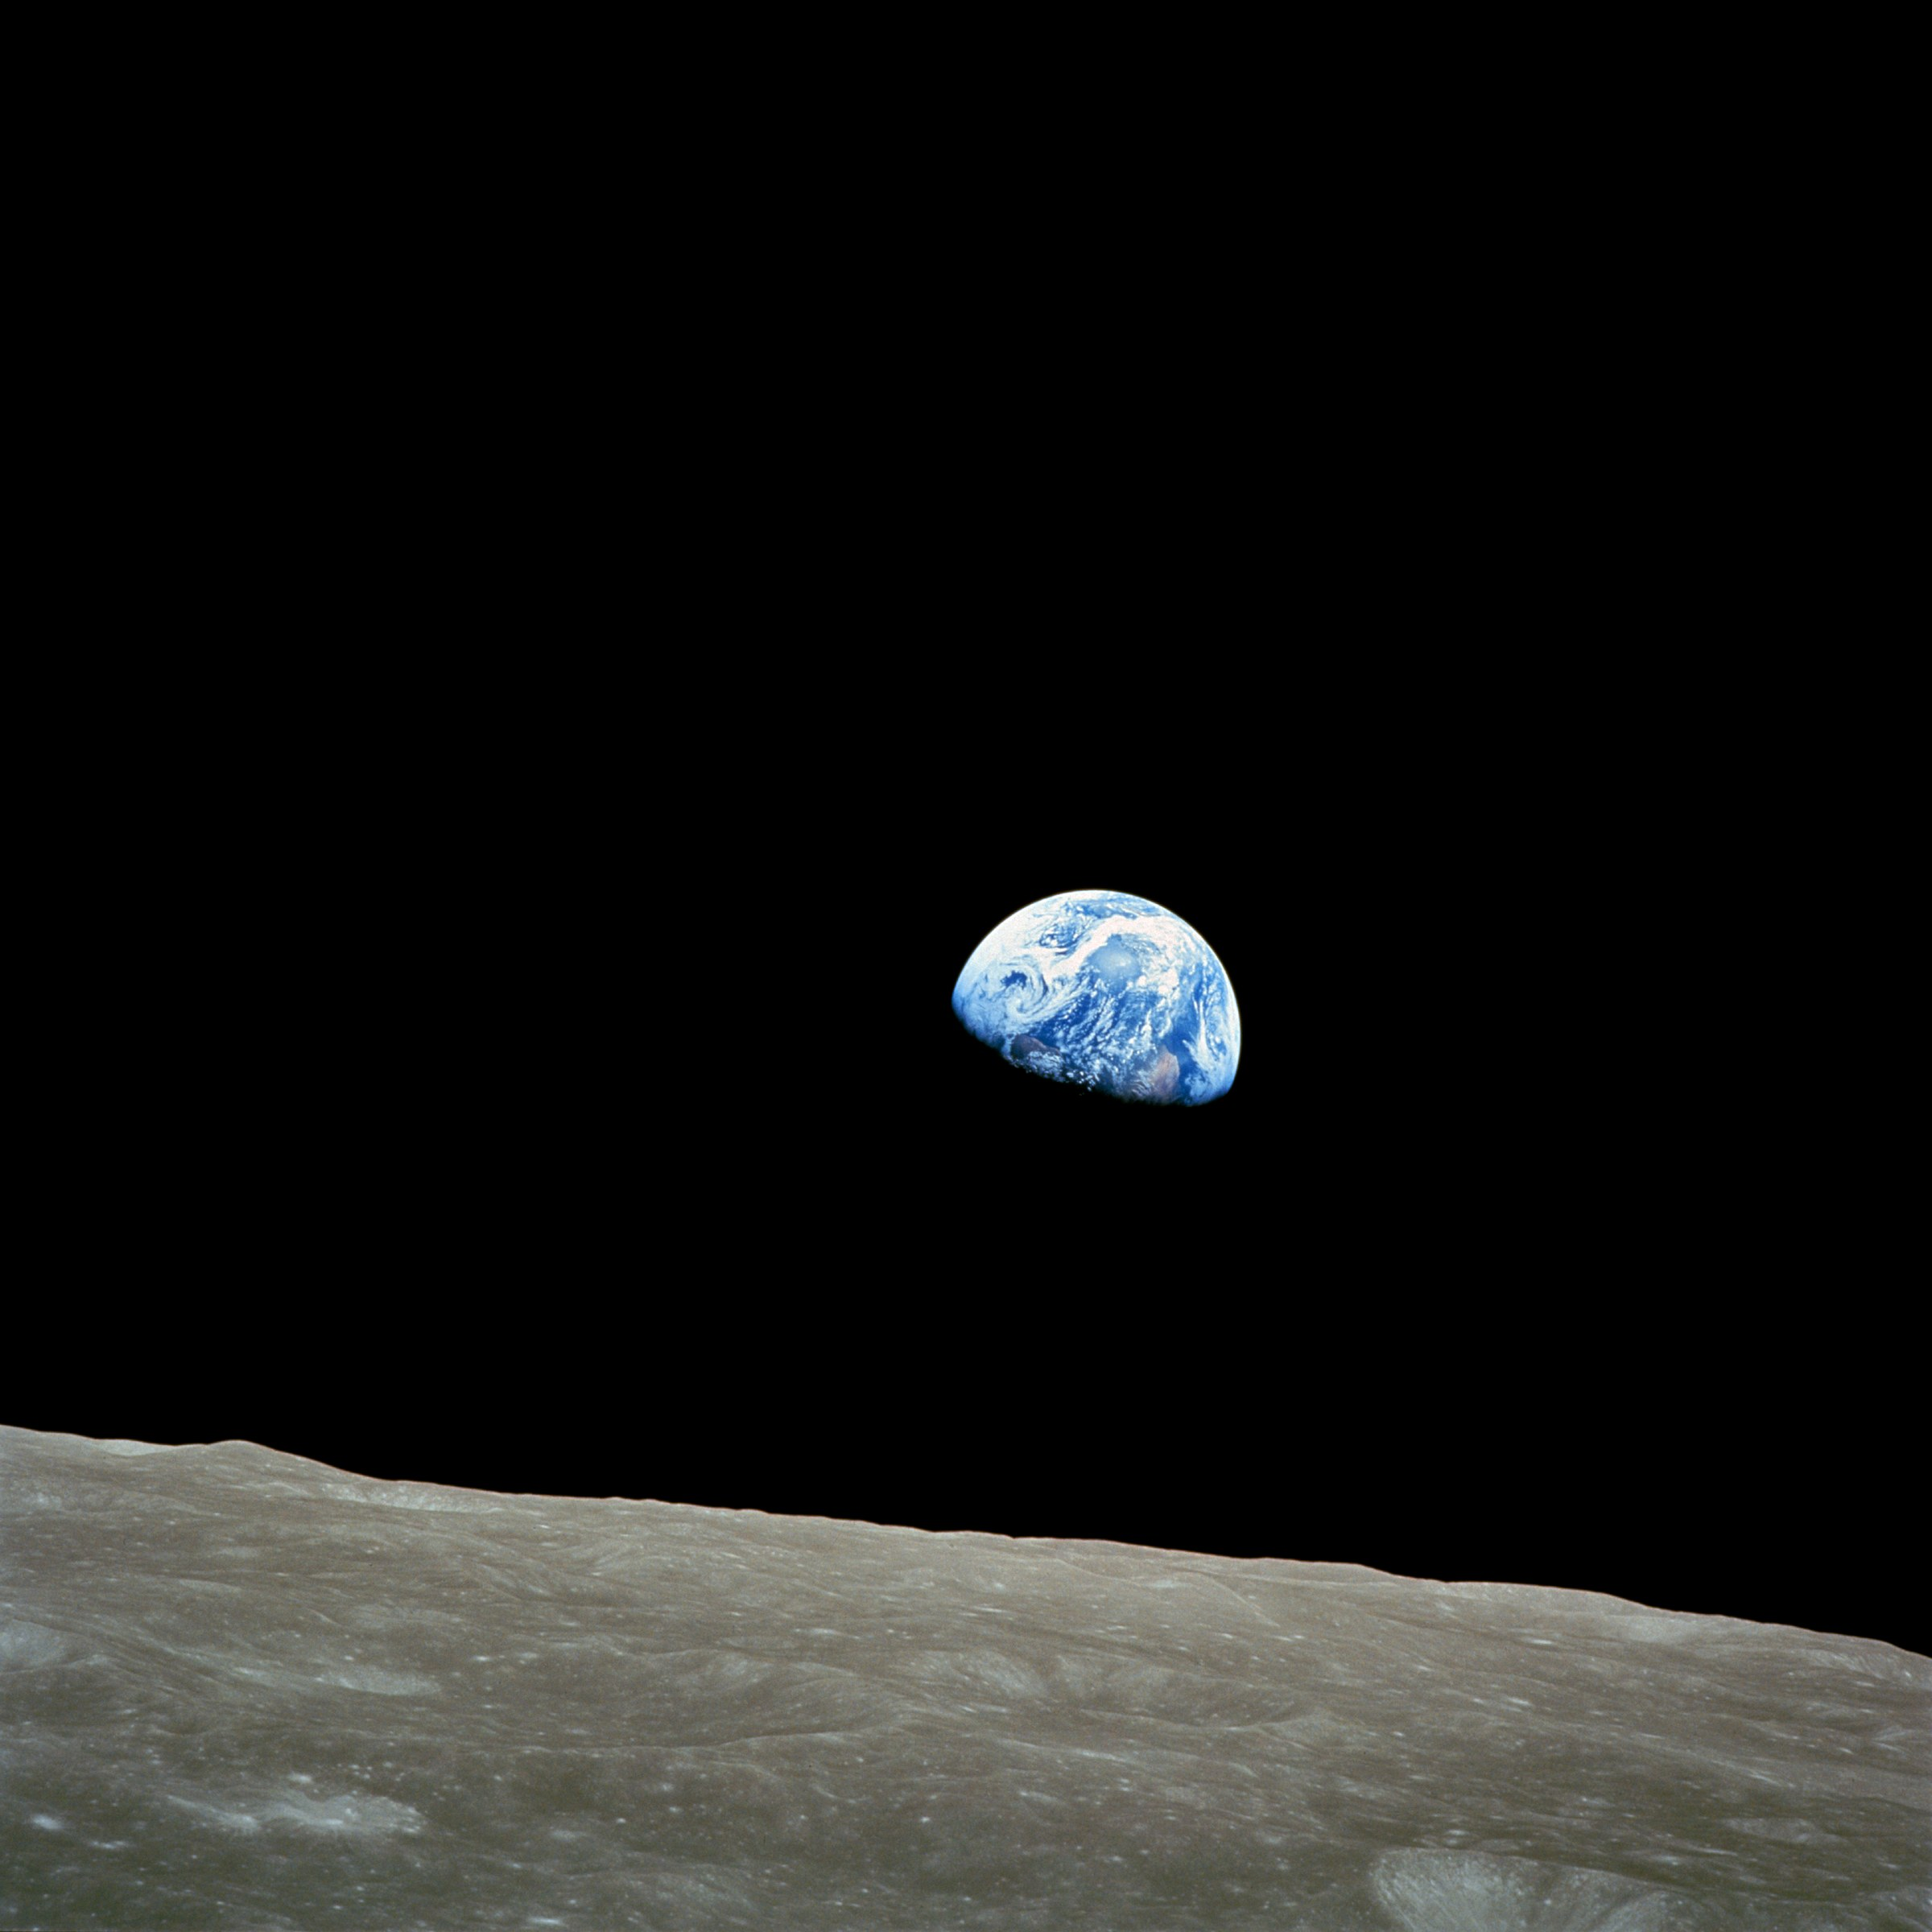 Terra vista dalla Luna